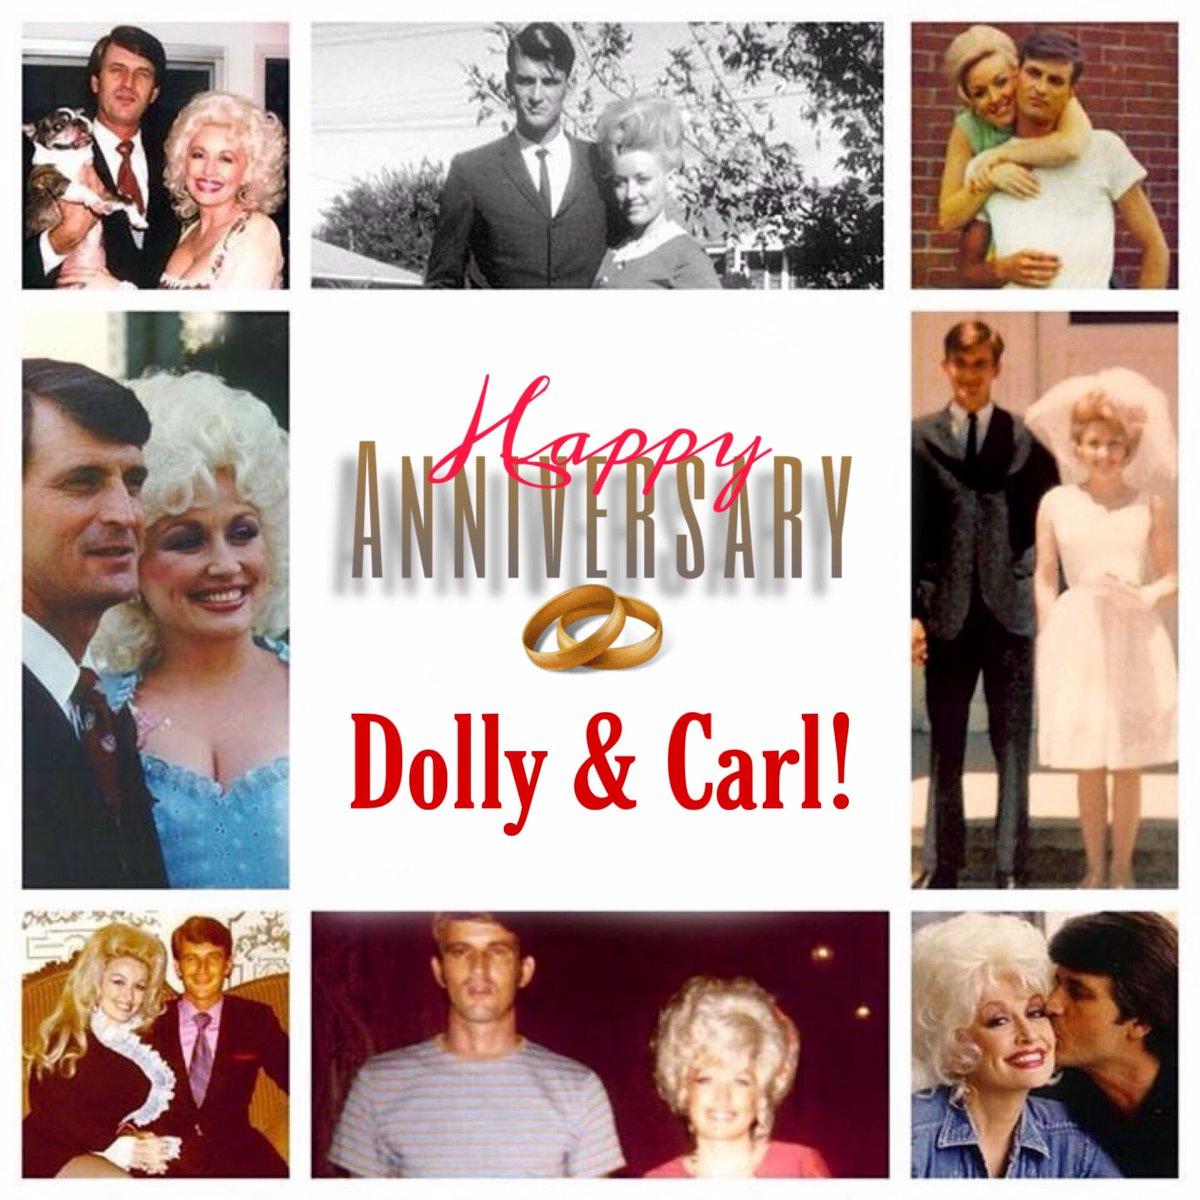 Happy 54th Anniversary @DollyParton and Carl! #dollyparton #dolly #dollyandcarl #happyanniversary #anniversary pic.twitter.com/PyGGvWsfmh